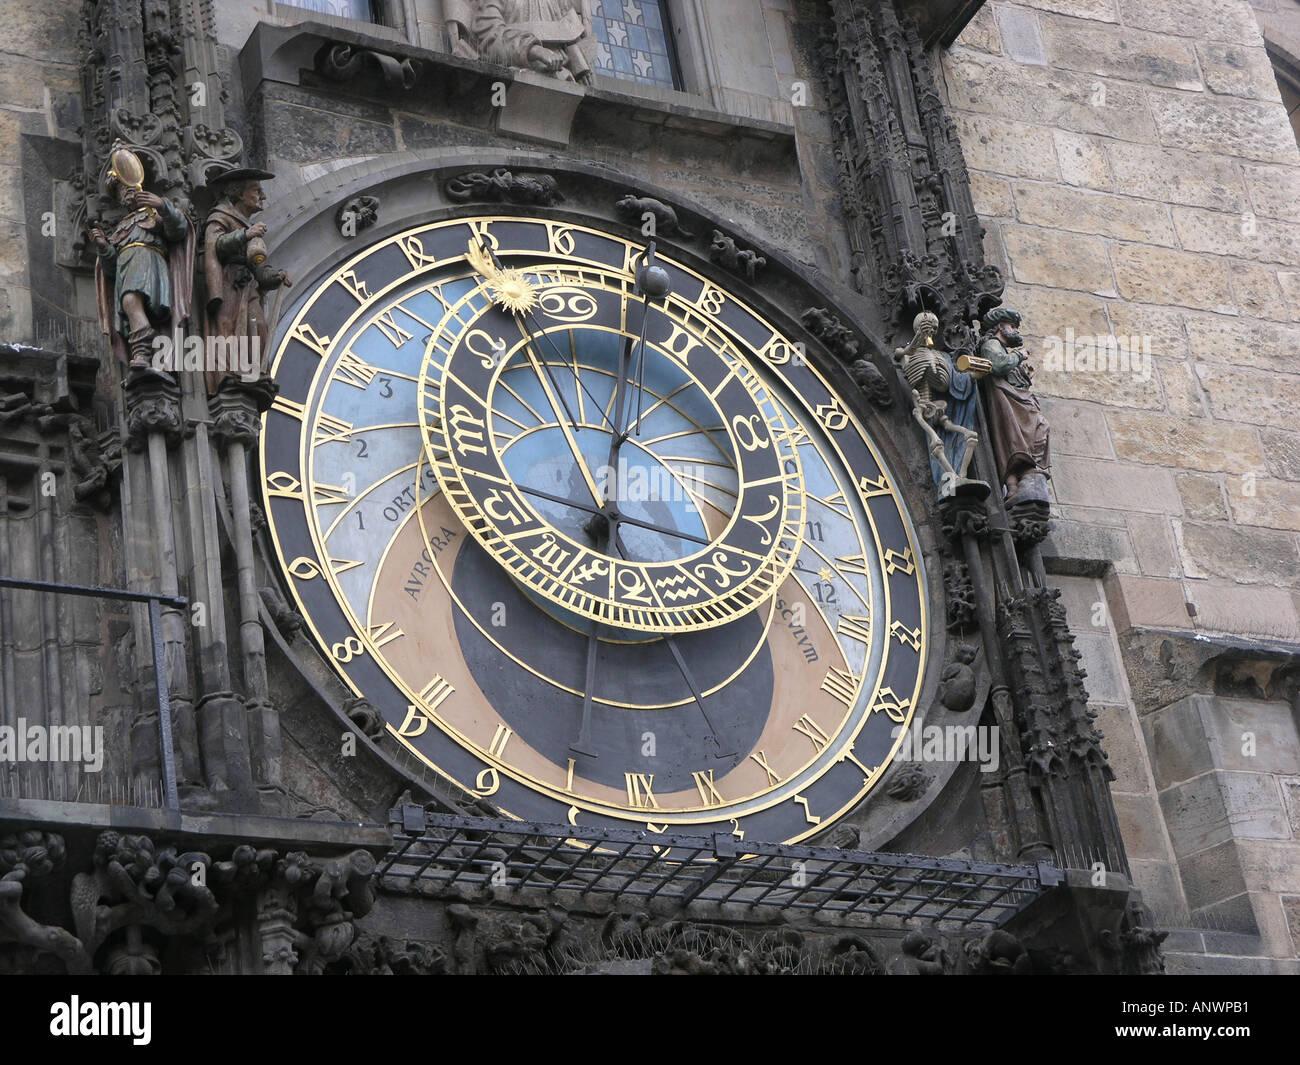 Astronomical Clock Old Town Square Prague Czech Republic Europe - Stock Image